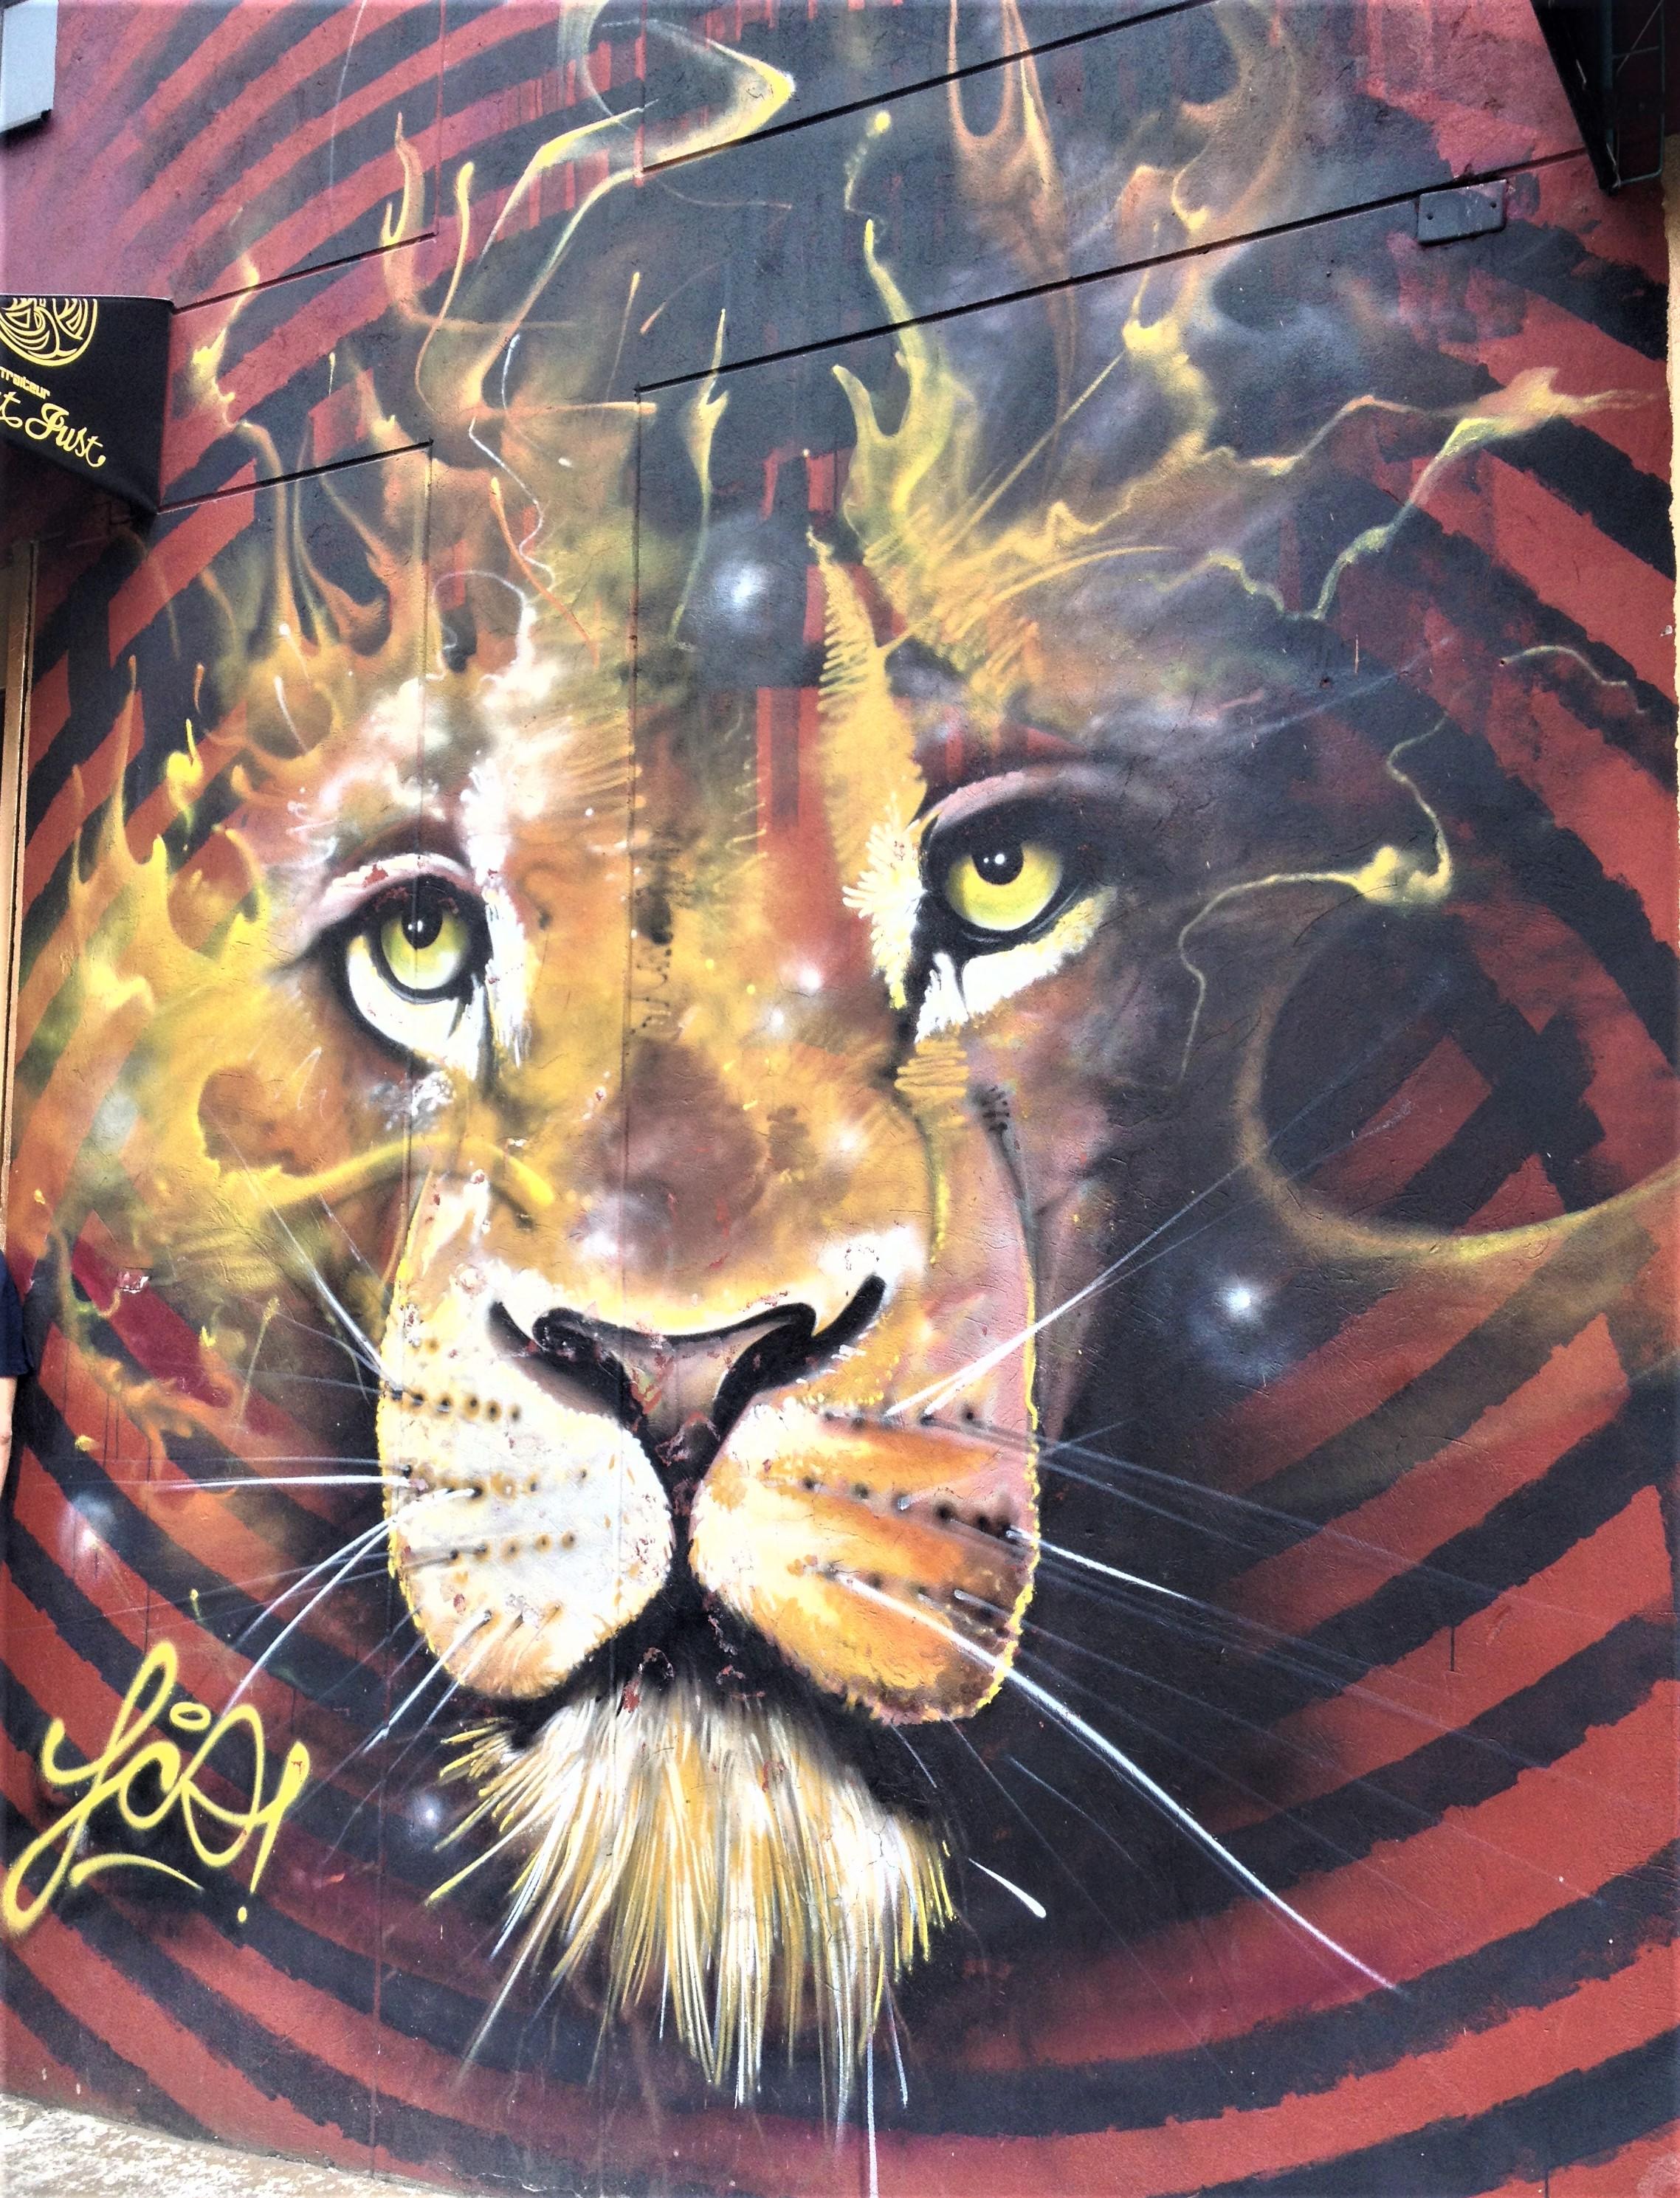 bogota colombie street art graffiti